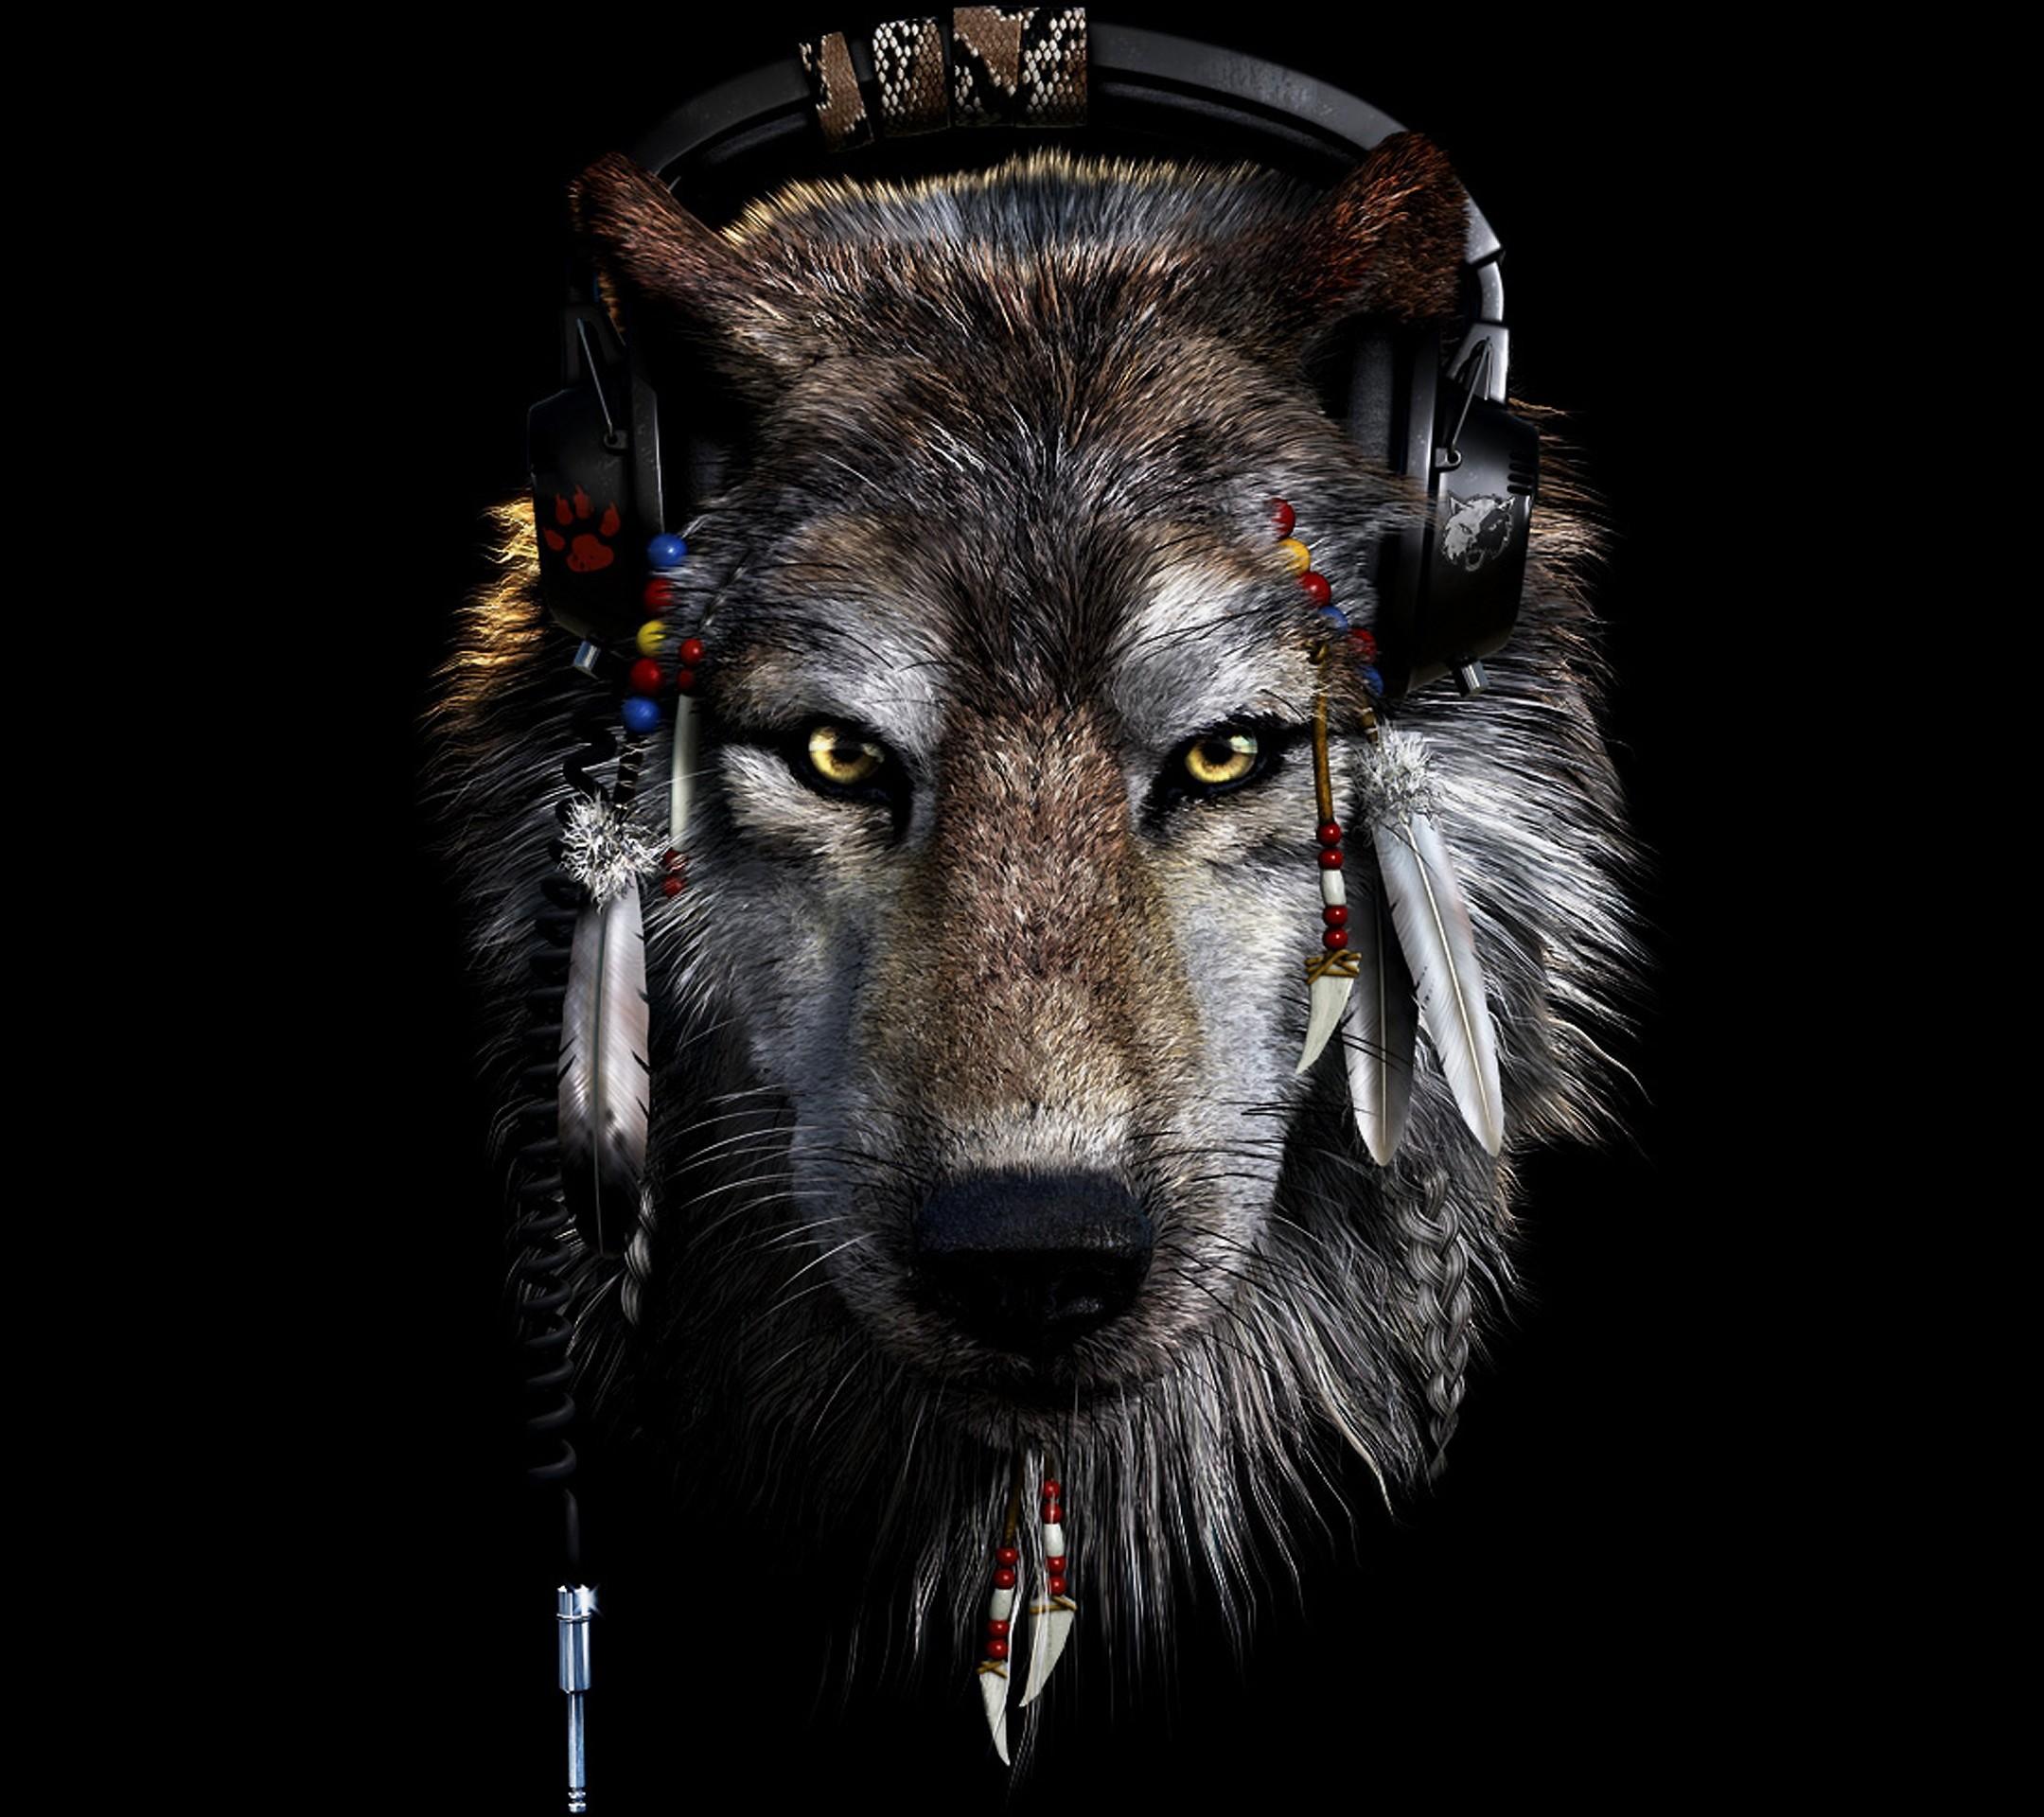 3d Wallpapers Download For Windows Xp Dark Wolf Wallpaper 183 ①